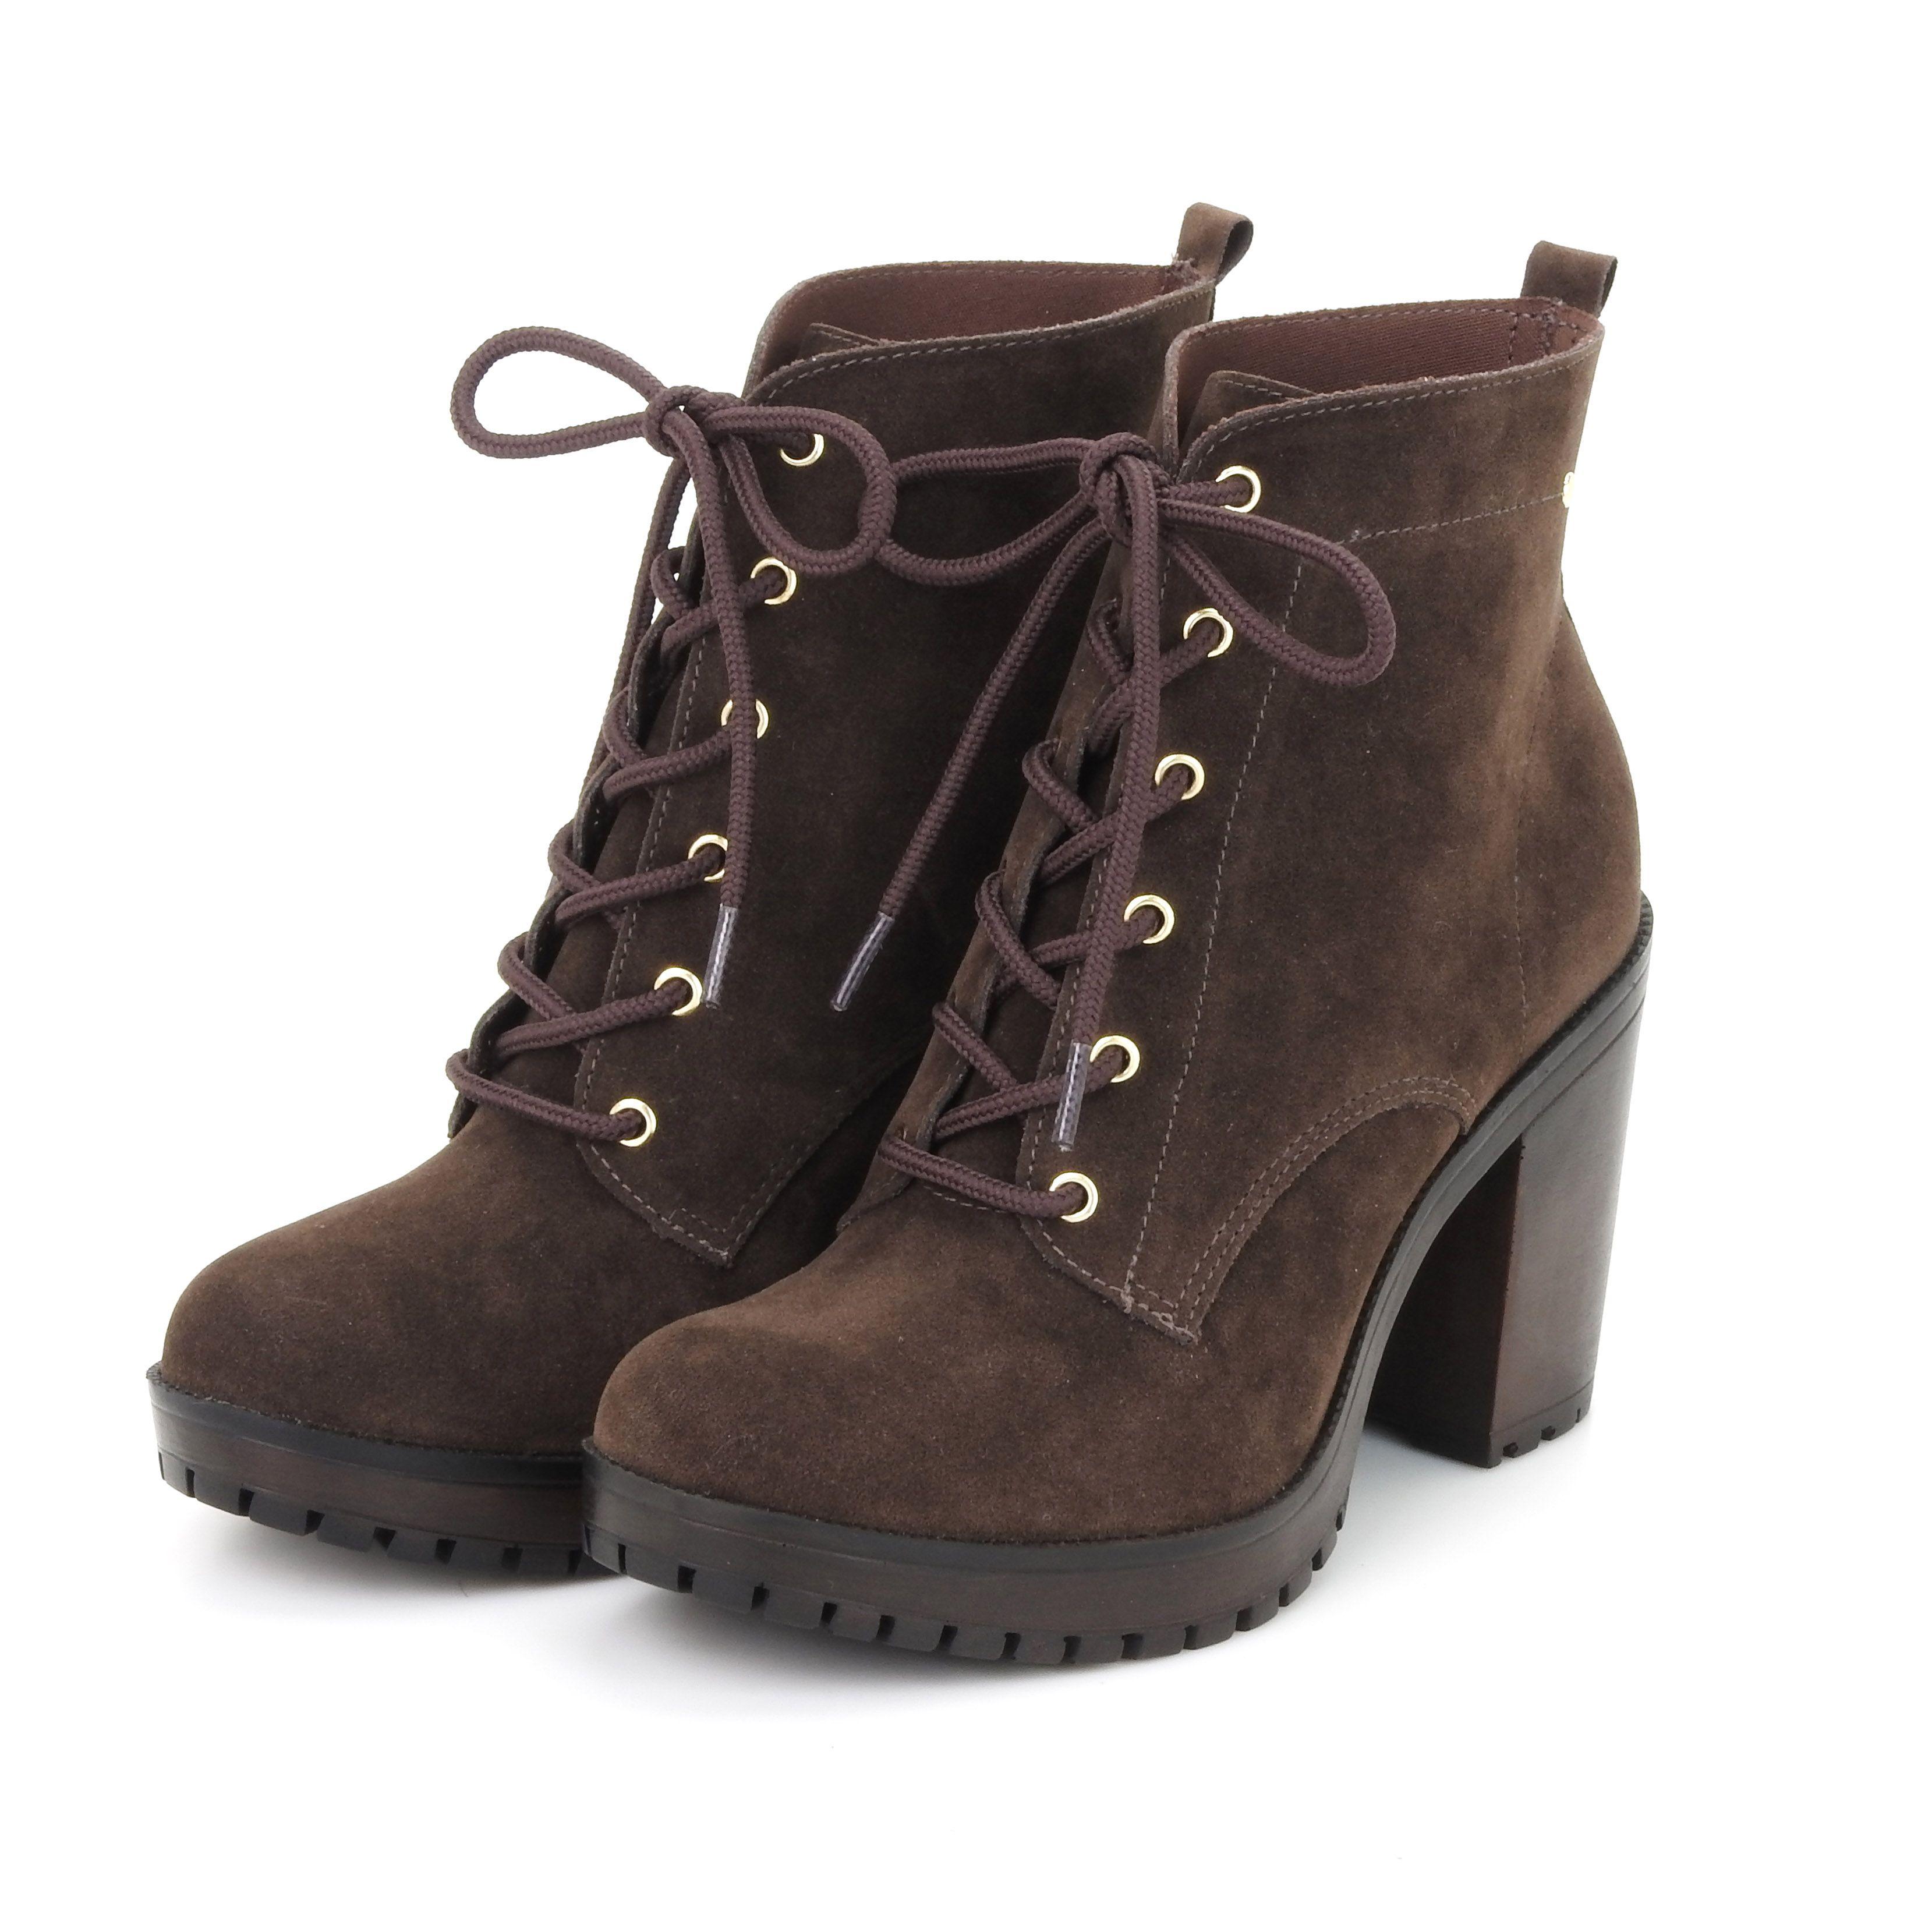 Bota Coturno Feminina Dakota Preto | Sapatos bonitos